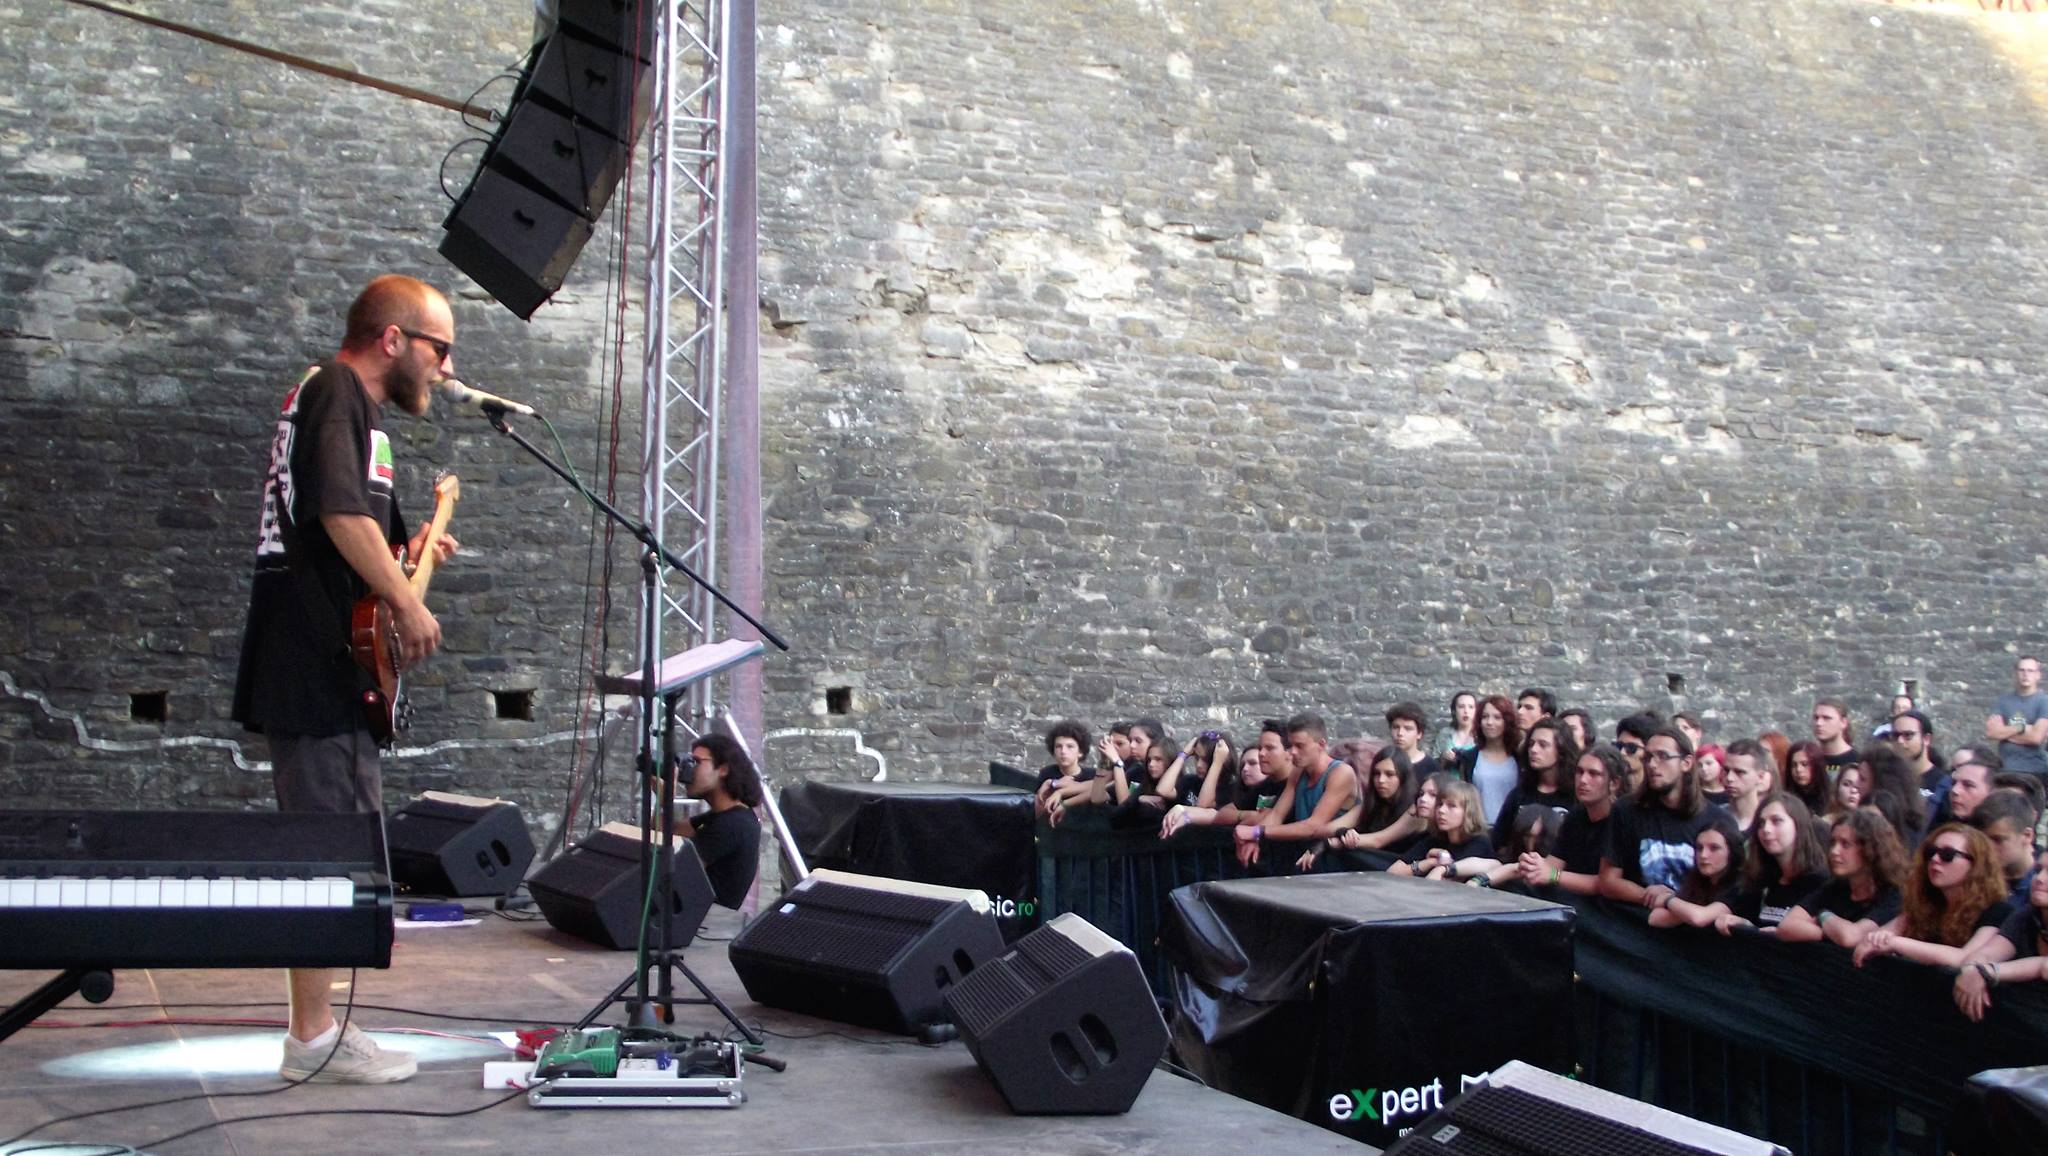 Coso rock 2